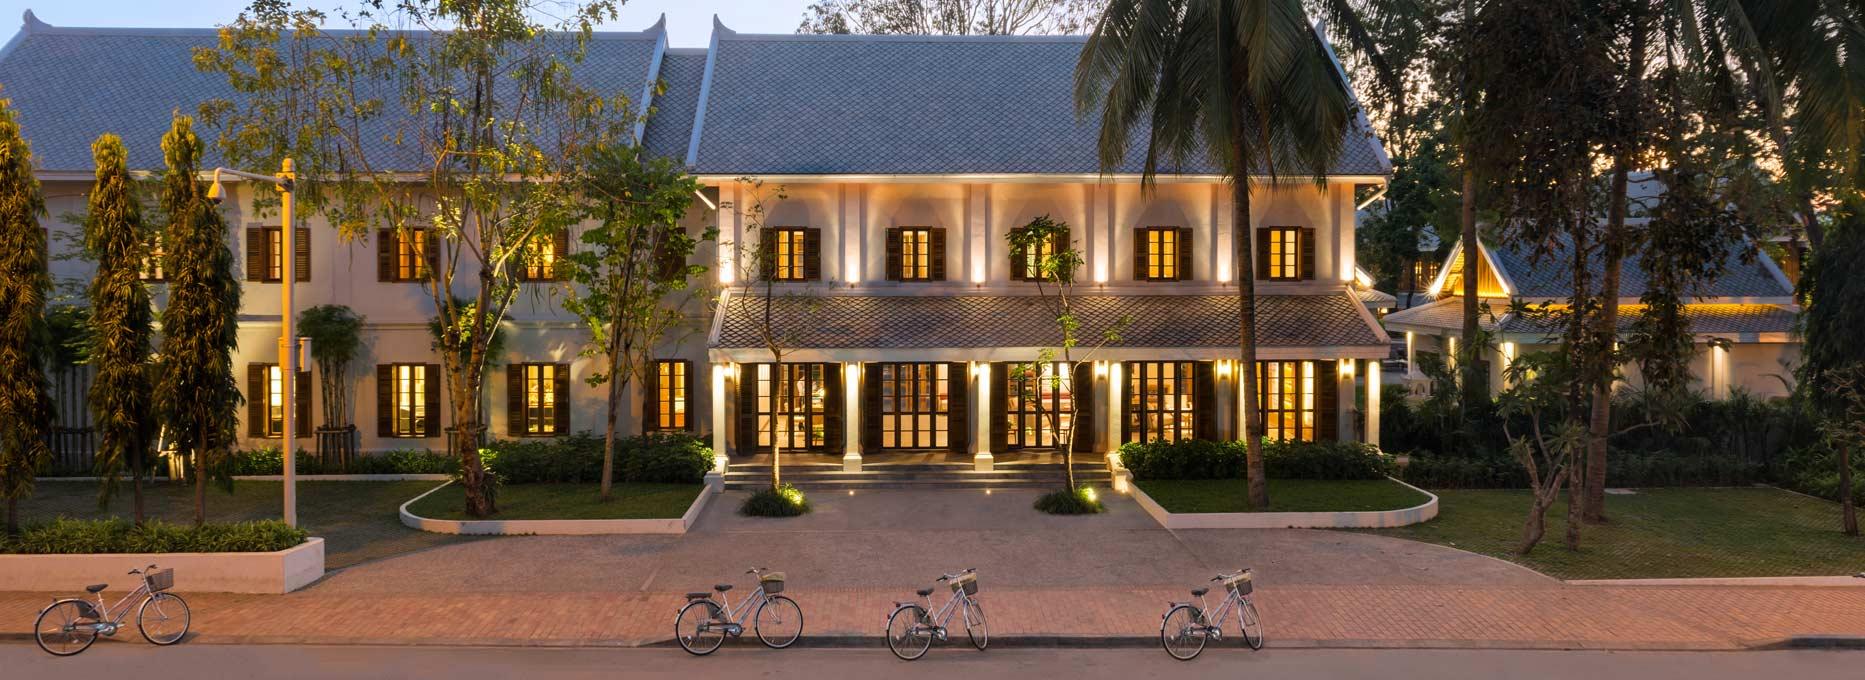 AVANI Luang Prabang - Exterior at Night